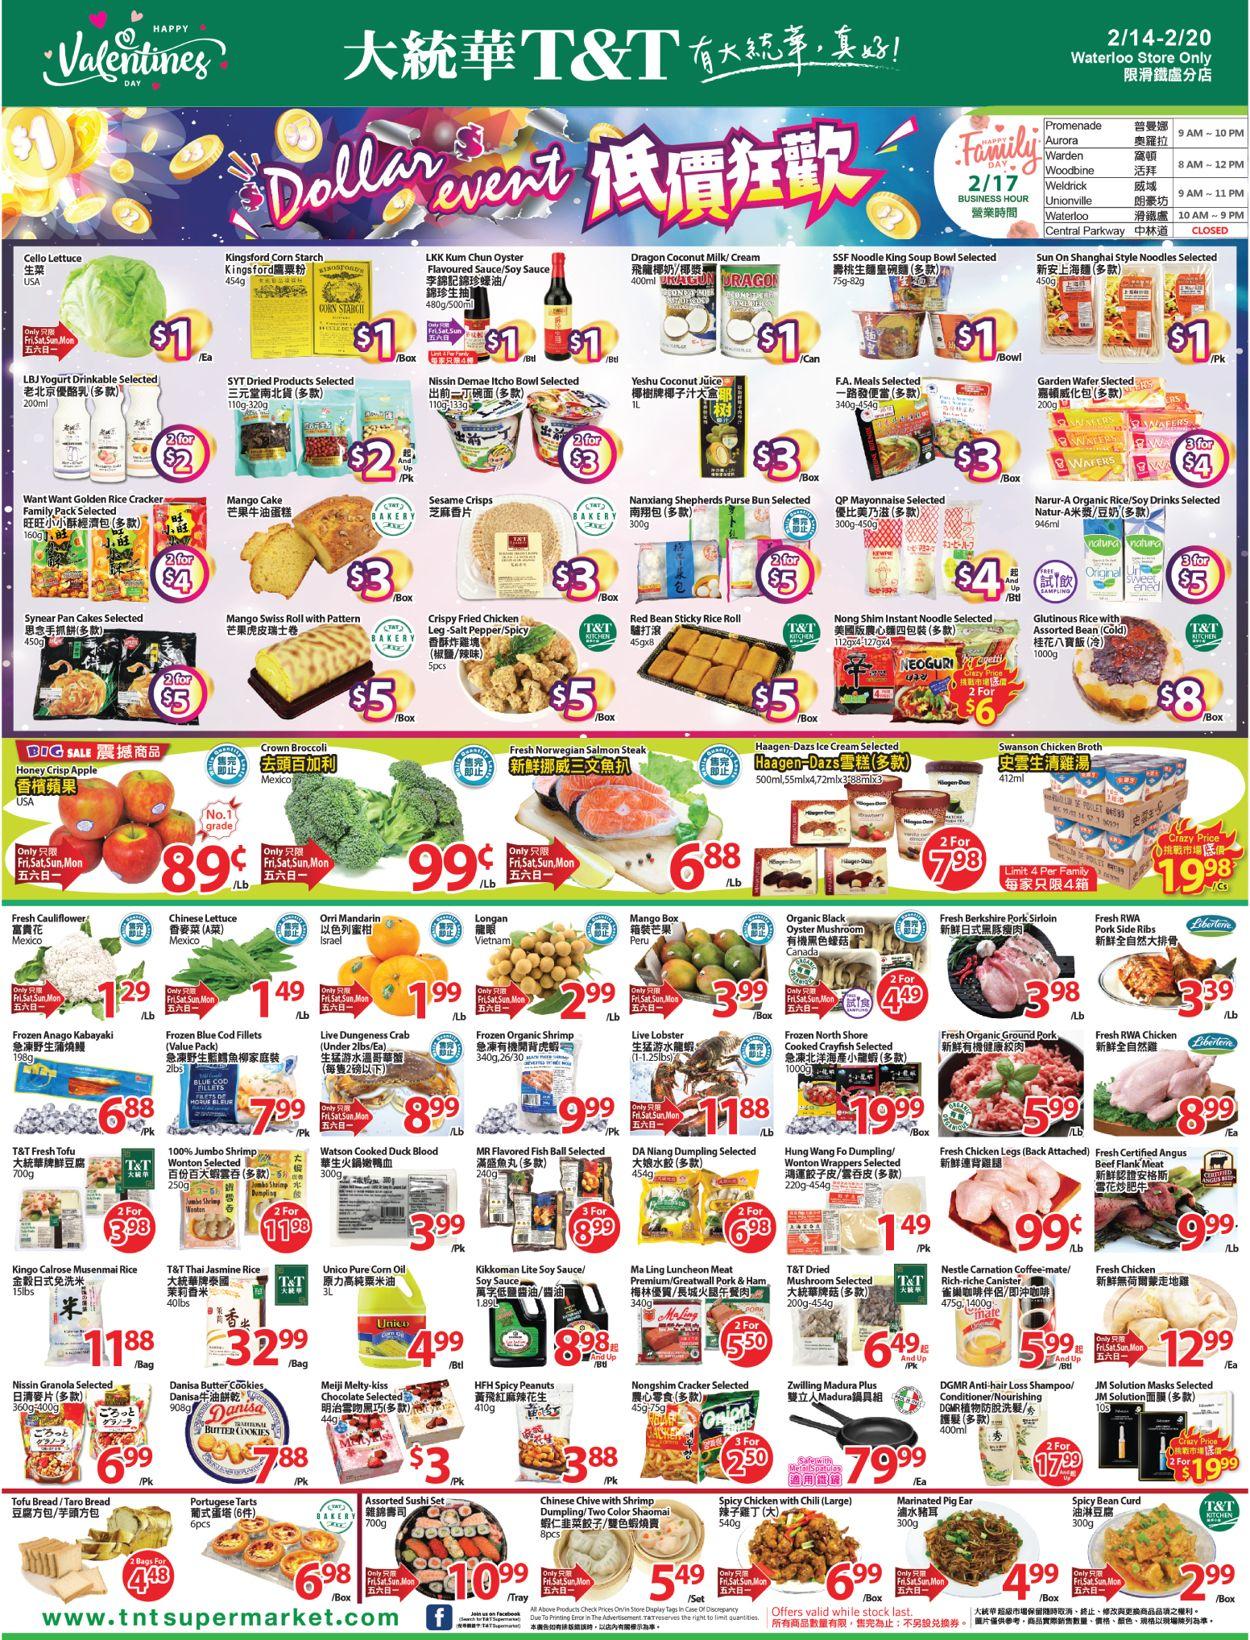 T&T Supermarket Flyer - 02/14-02/20/2020